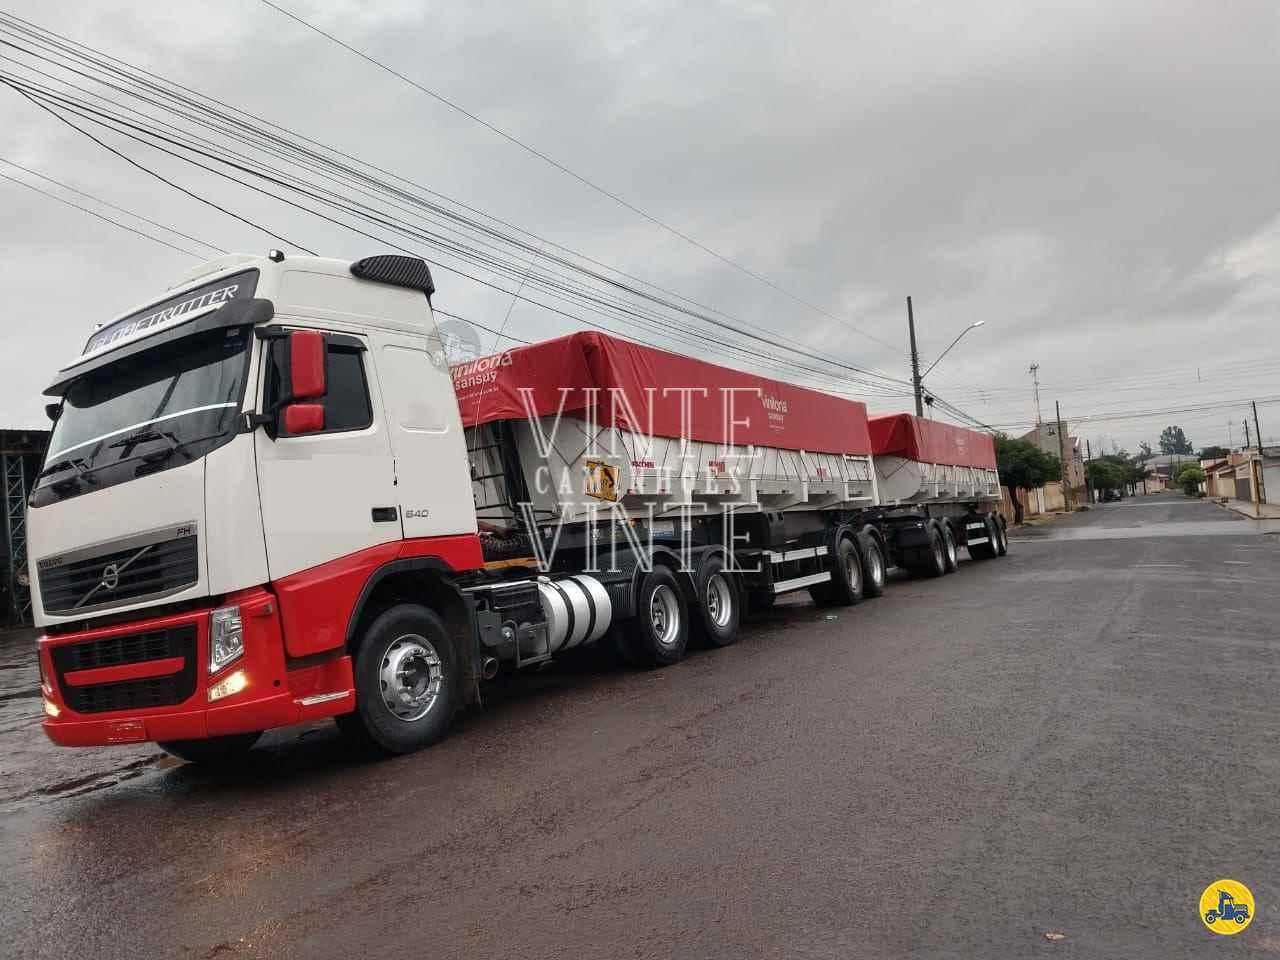 VOLVO FH 540 de Vinte-Vinte Caminhões - SANTO ANDRE/SP